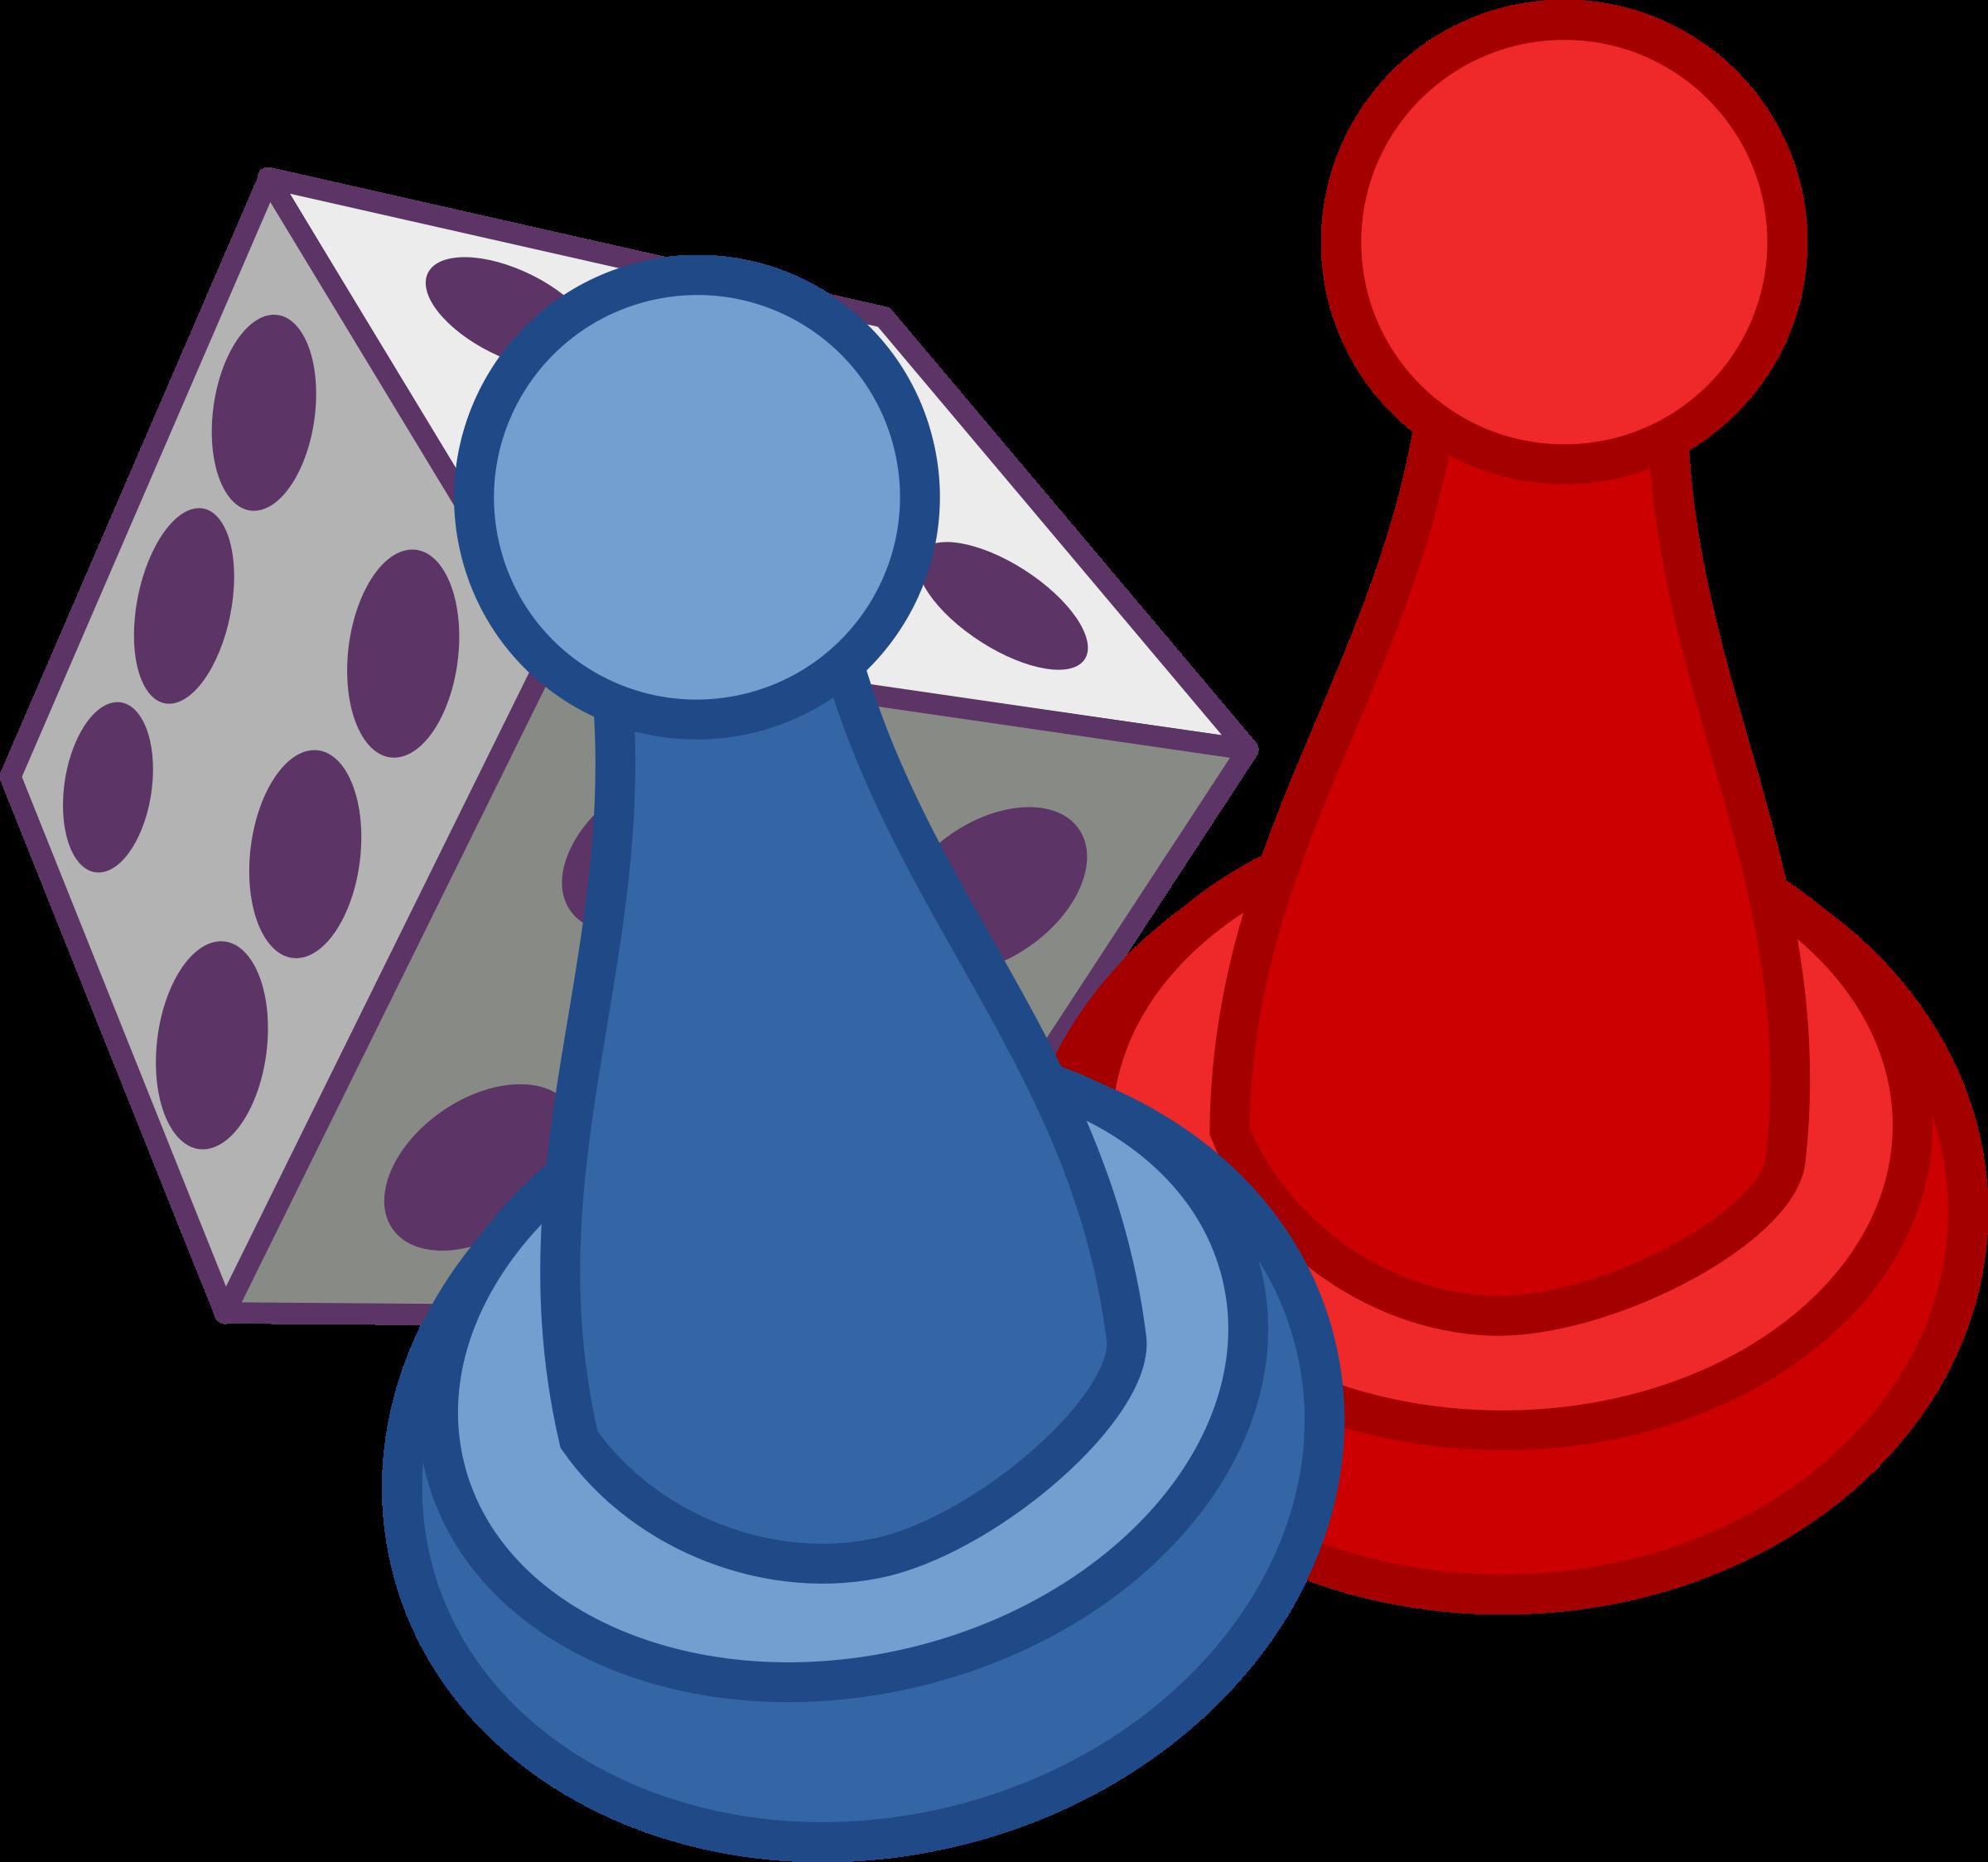 Games logo frames illustrations. Game clipart bean bag race